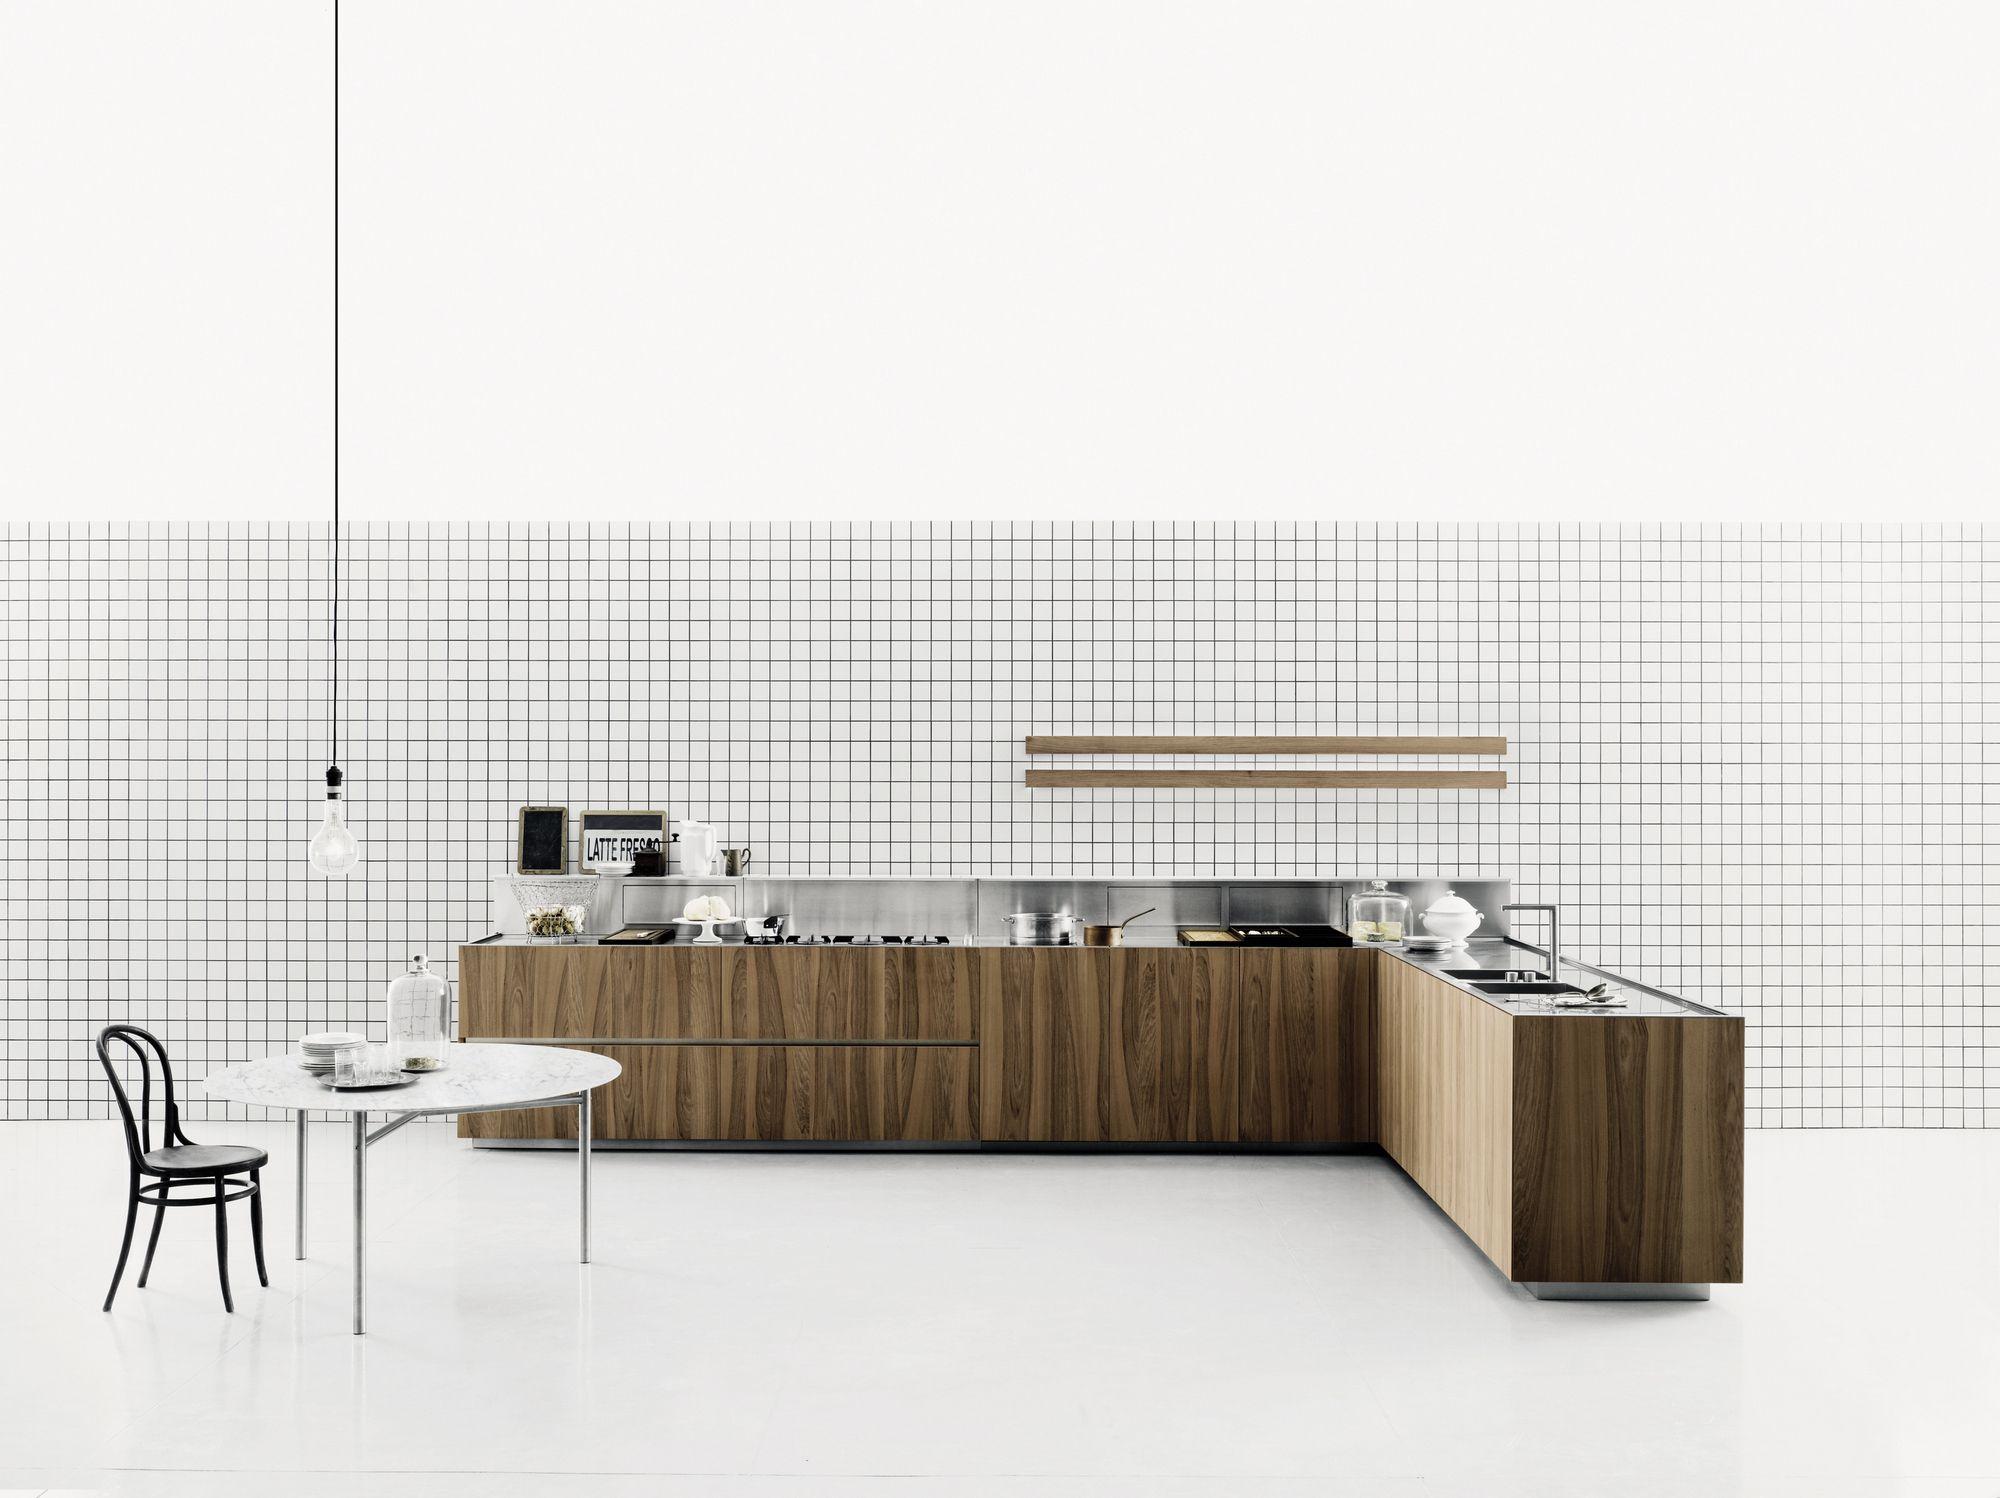 wood veneer kitchen k20 by boffi design norbert wangen. Black Bedroom Furniture Sets. Home Design Ideas